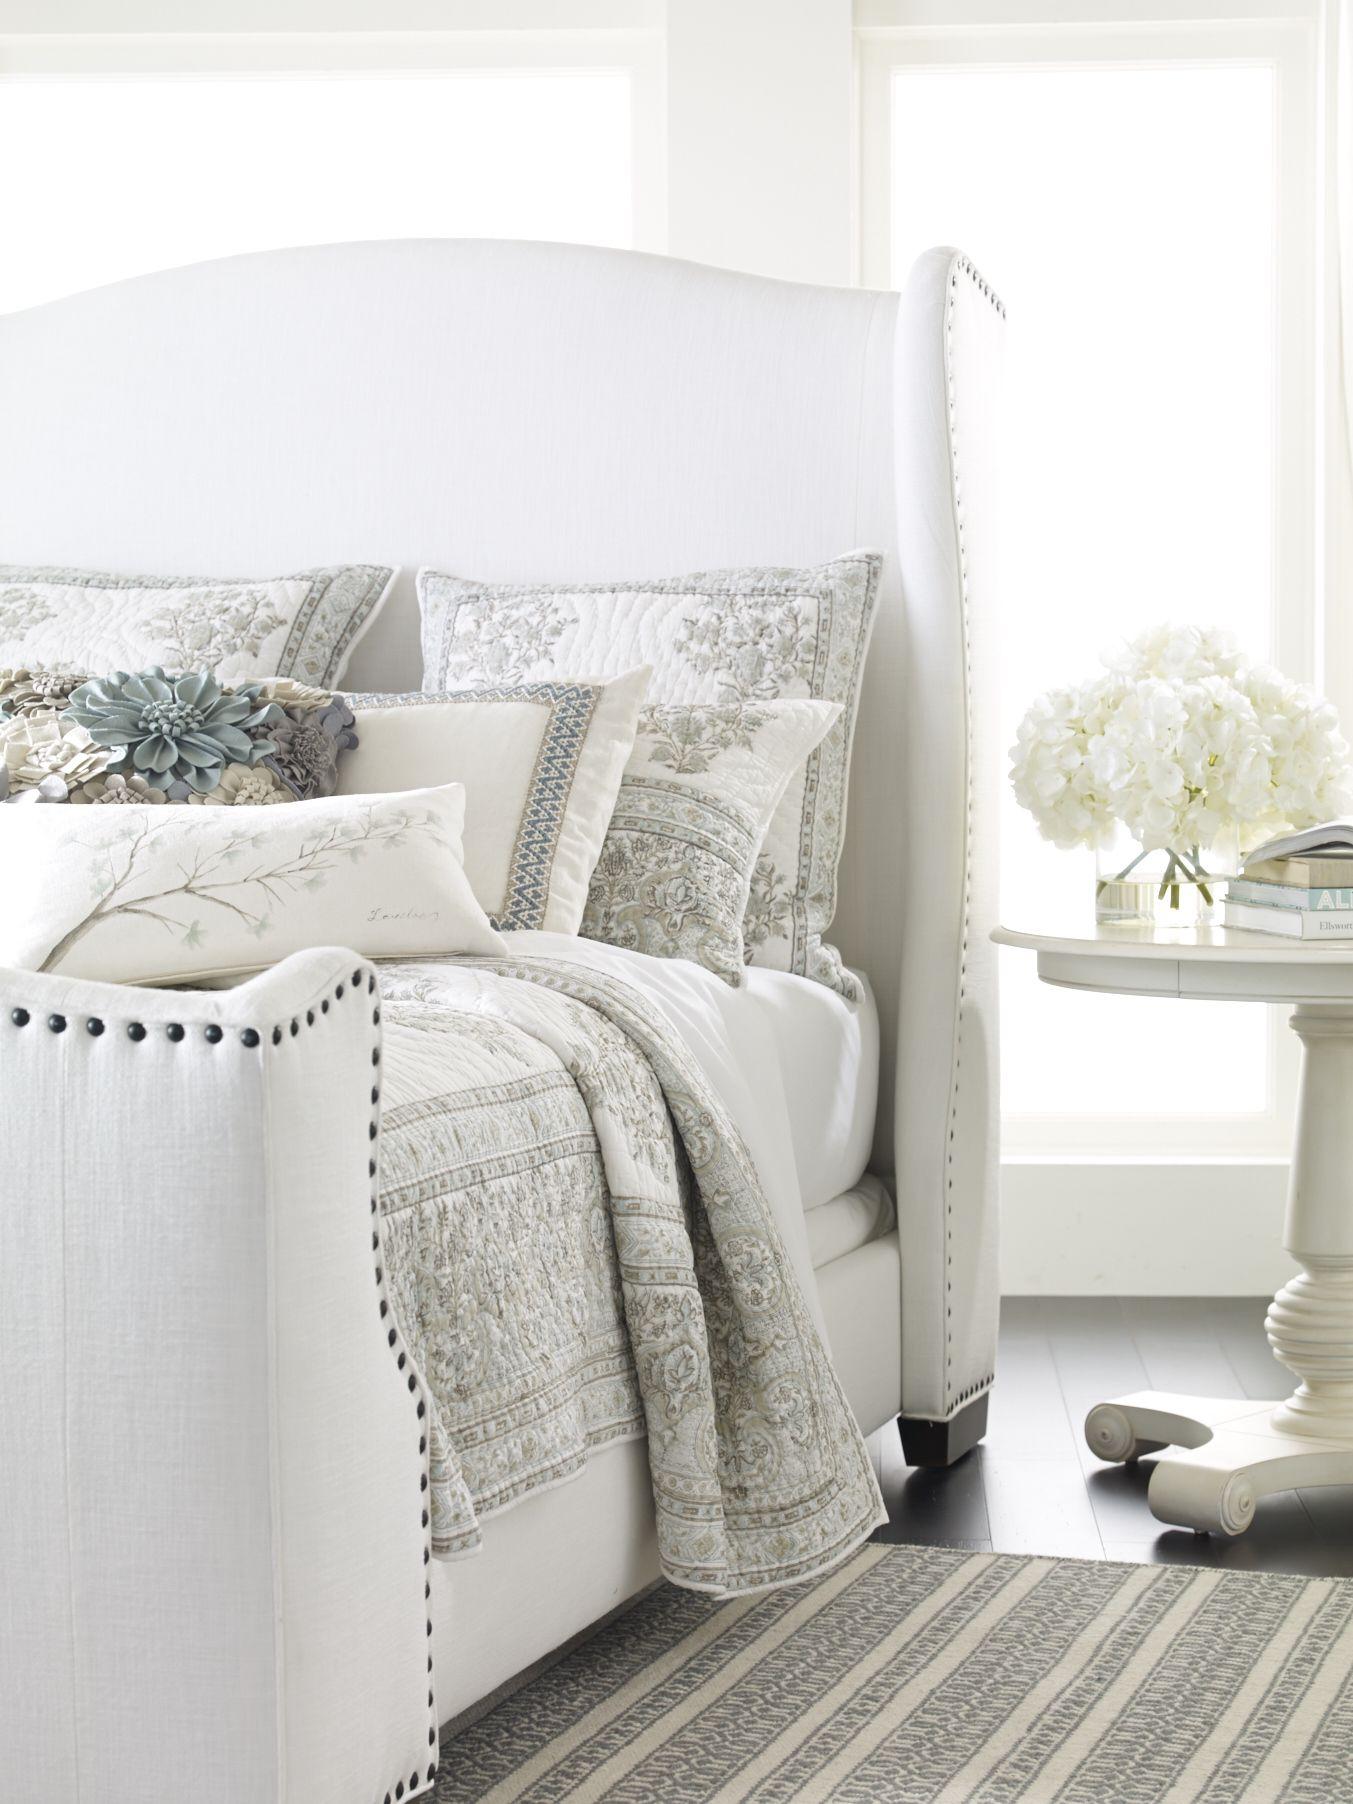 Master bedroom new design  Kayla Bed  B E D S  Pinterest  Bedrooms Closet designs and